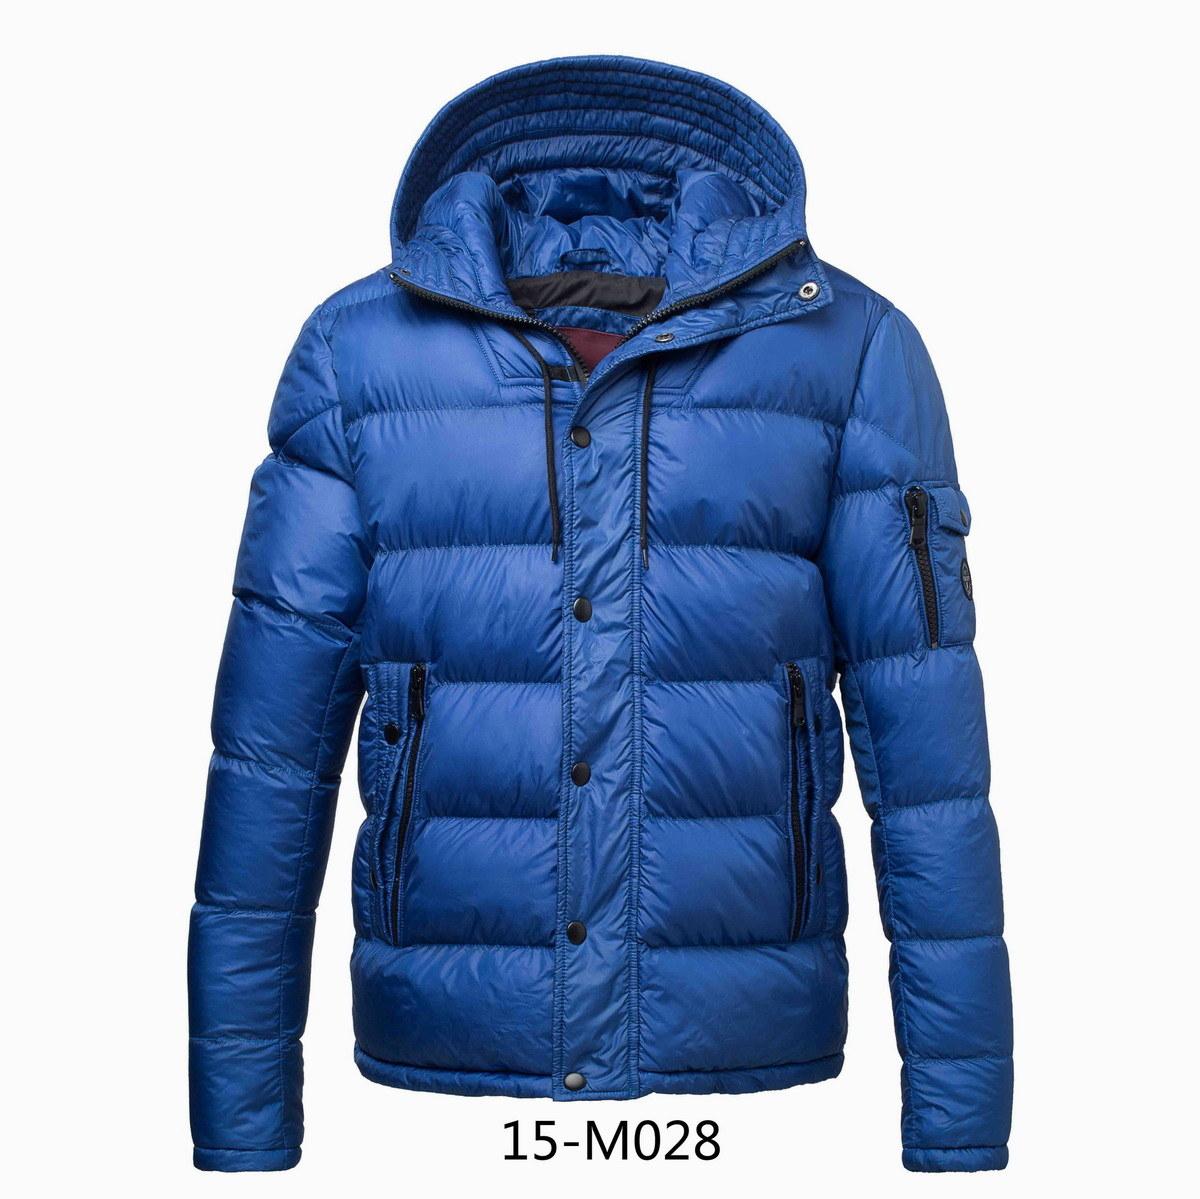 Men′s Winter Padding Hooded Jacket (15-M028)